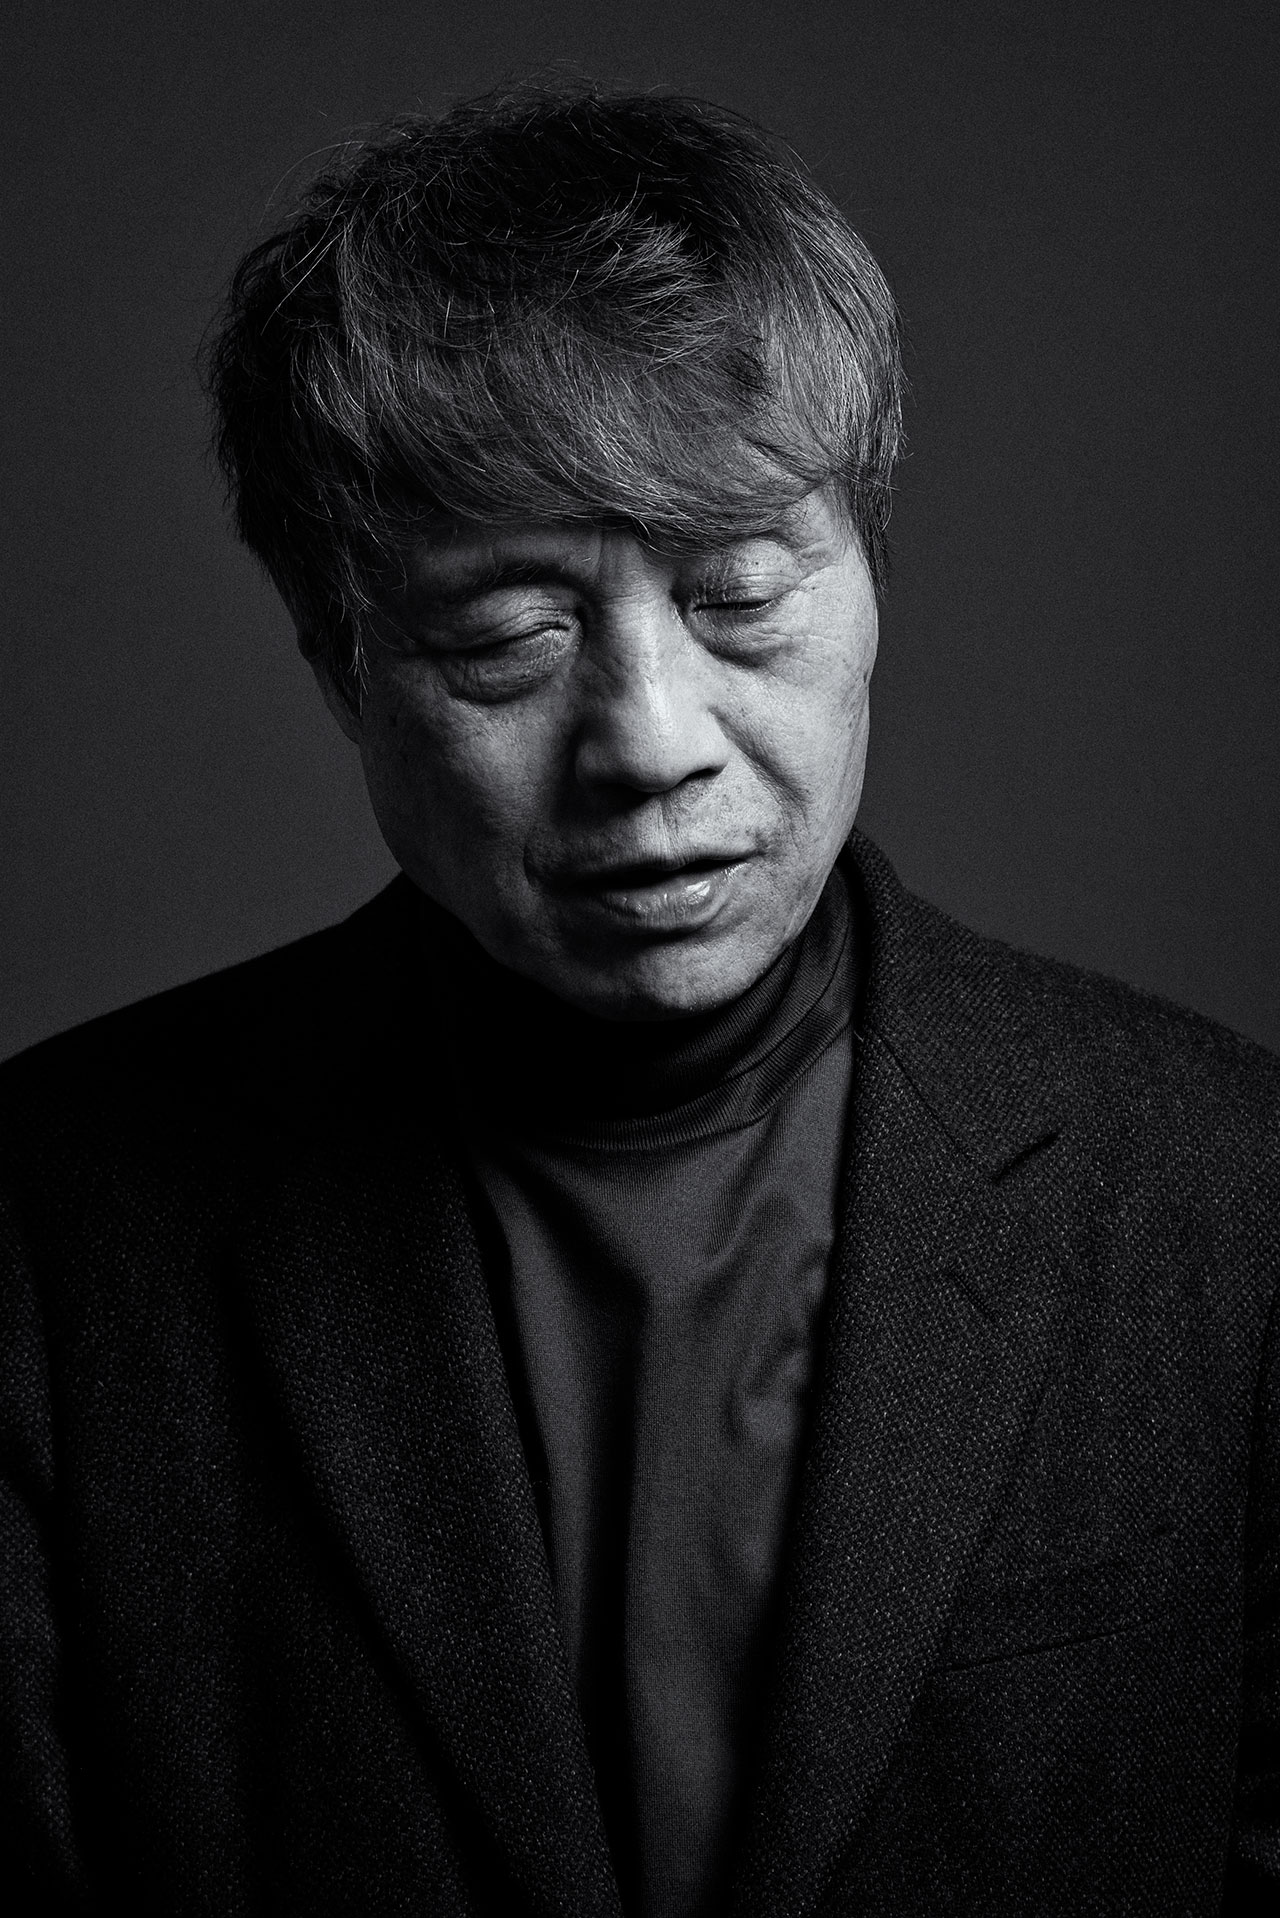 Photo by UTSUMI